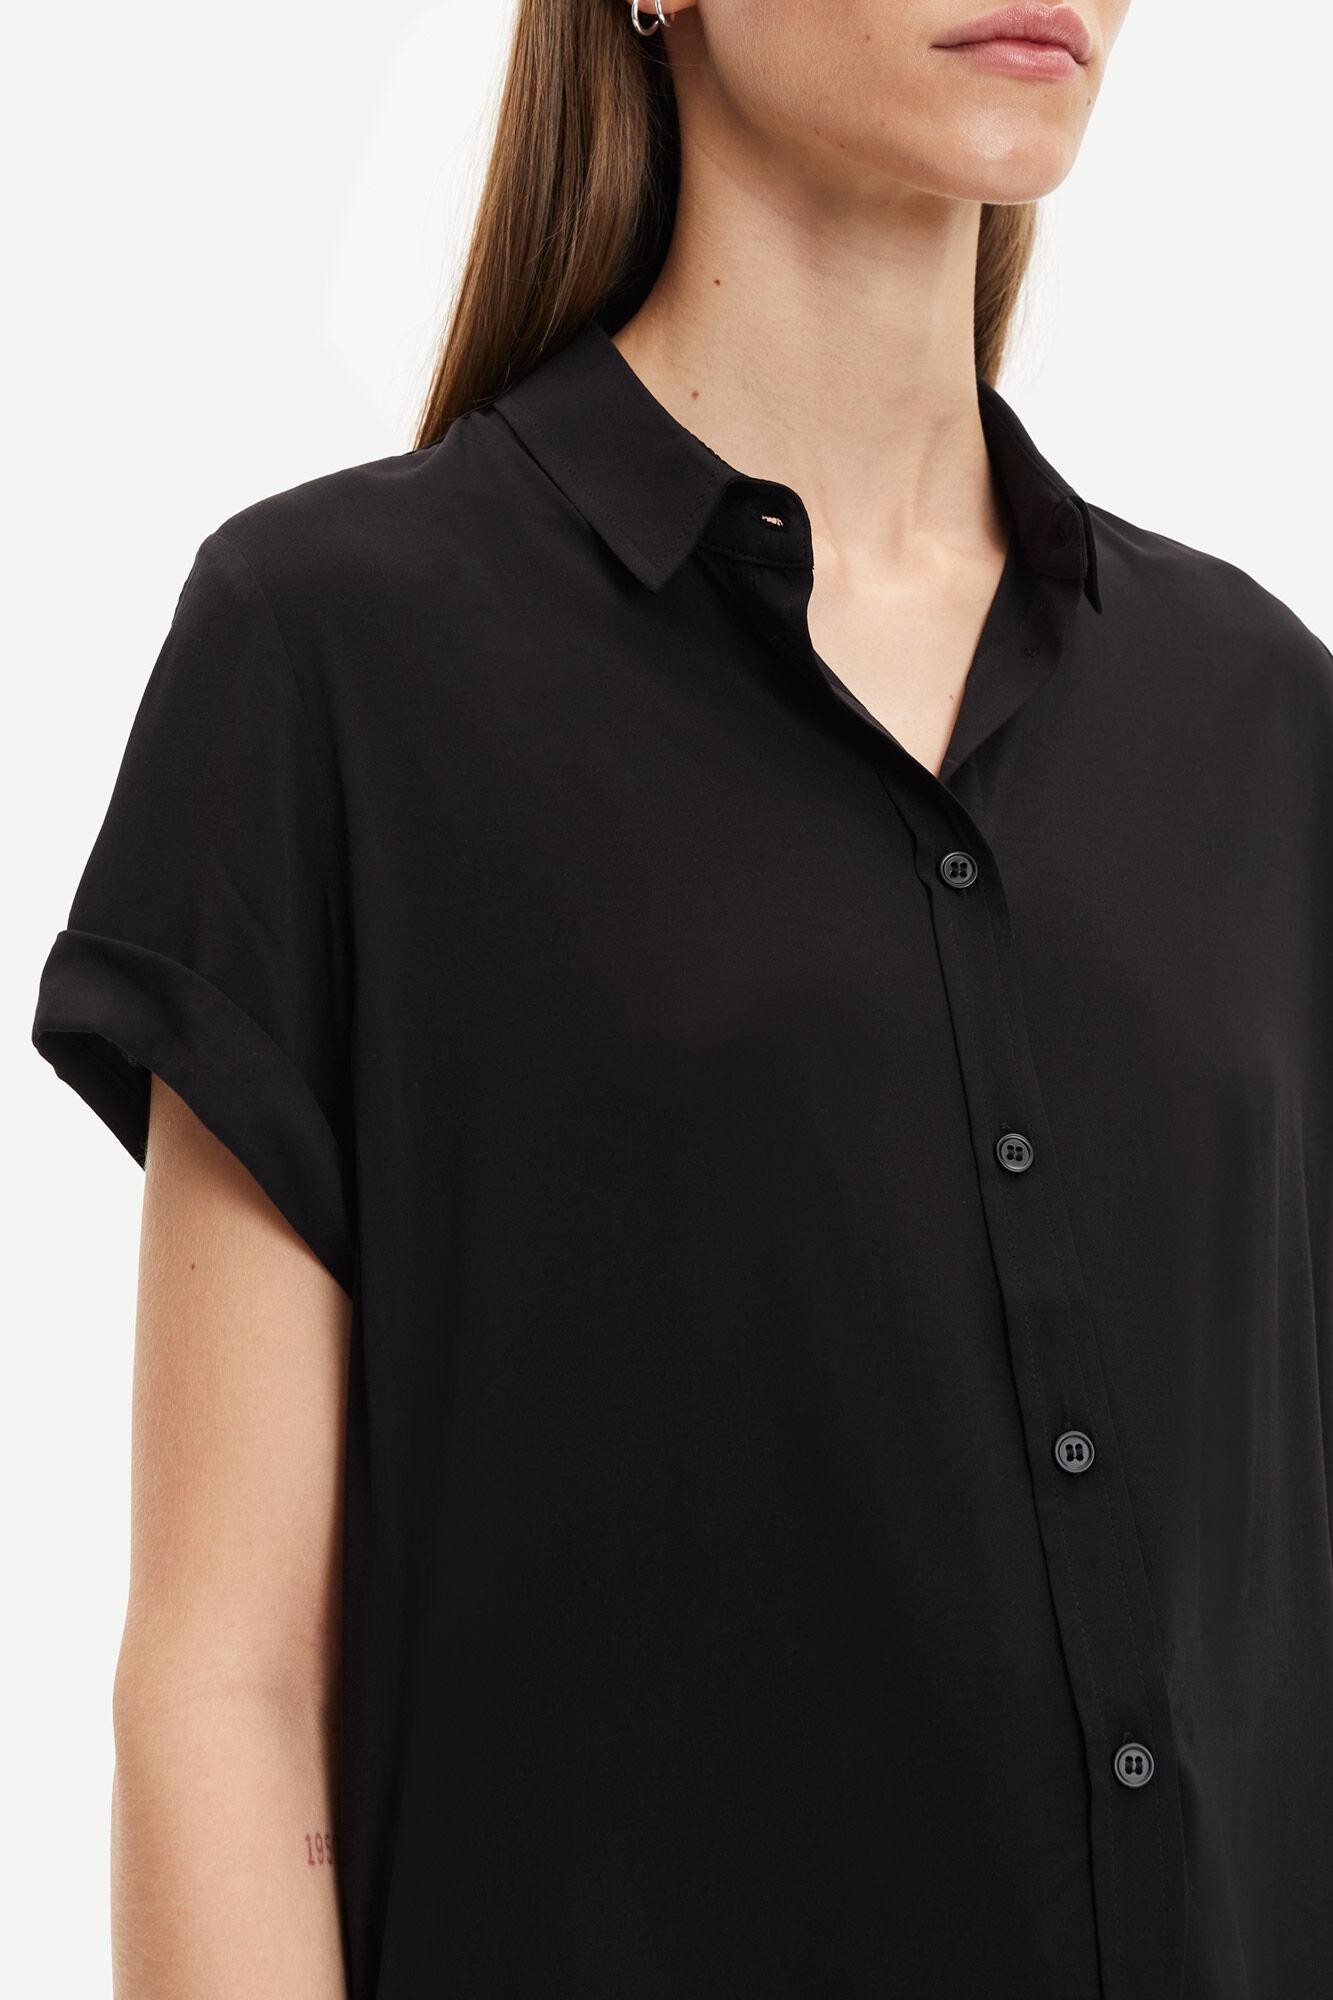 Samsøe & Samsøe Majan SS skjorte, black, x-small